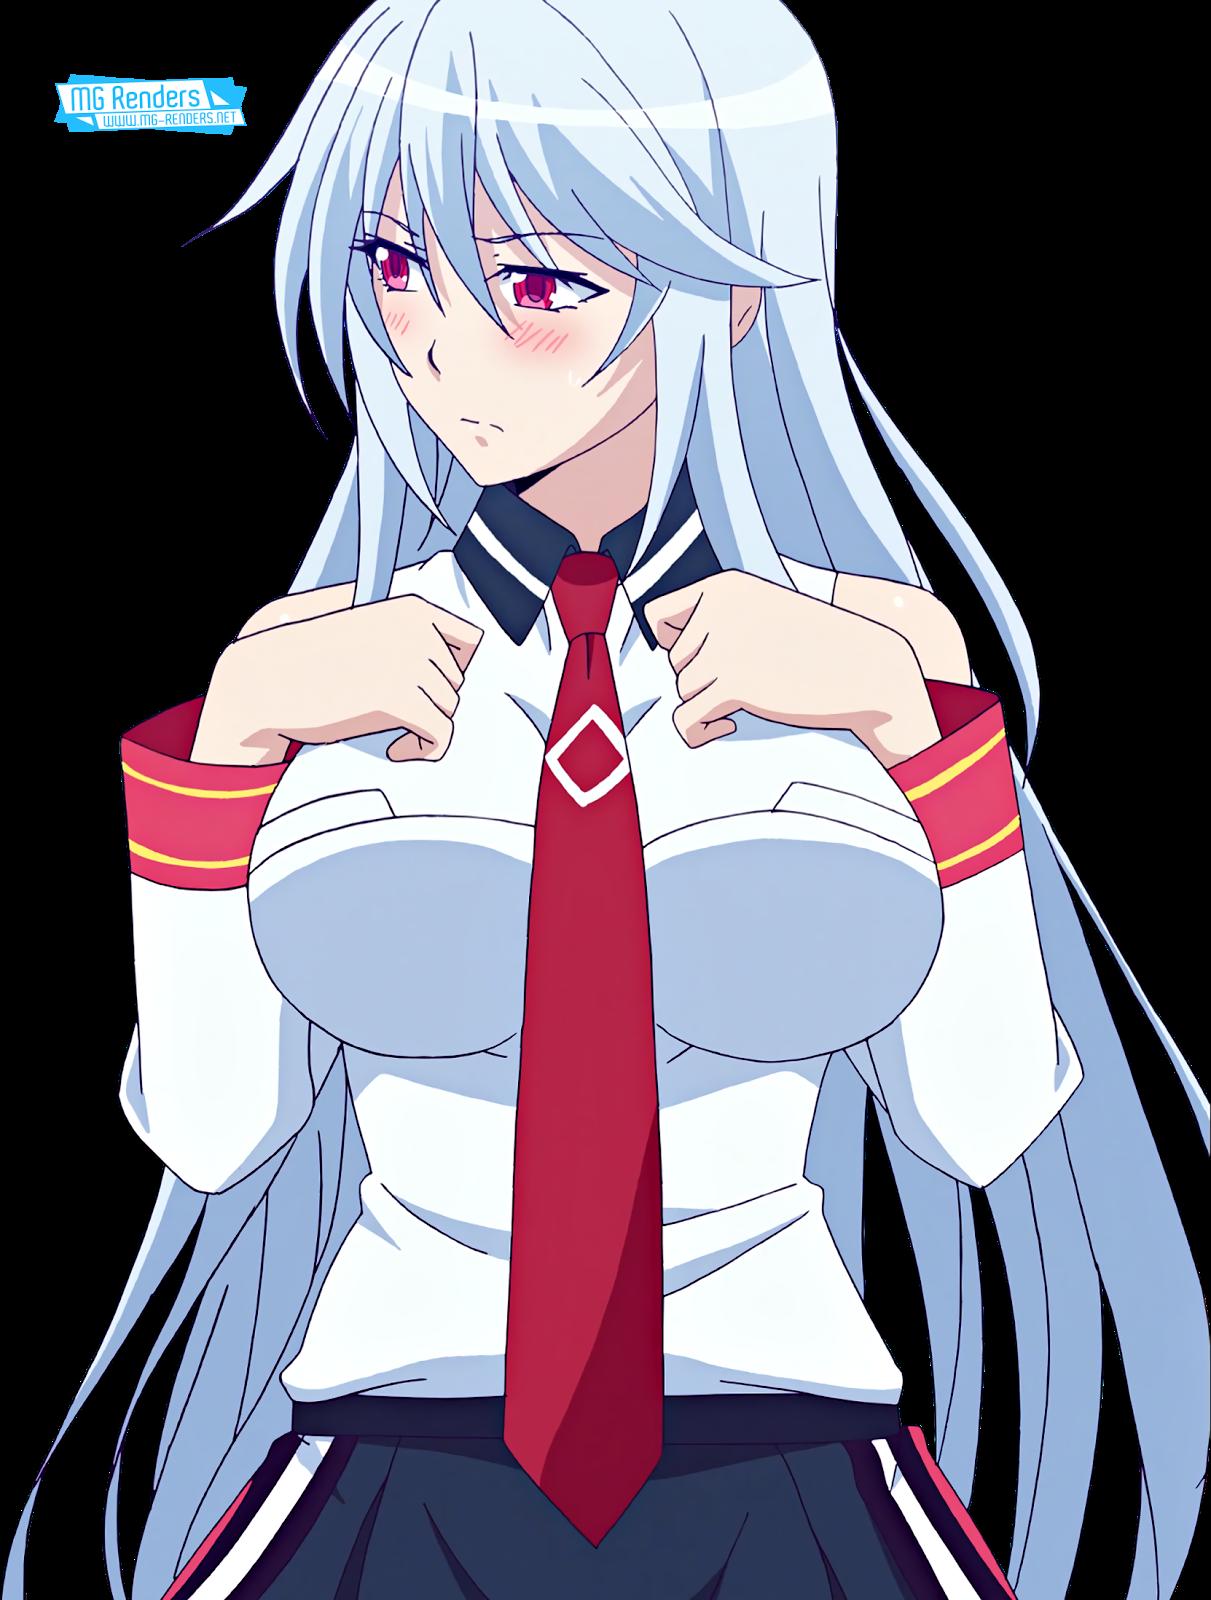 Tags: Anime, Render,  Chidorigafuchi Aine,  Masou Gakuen HxH,  Skirt,  PNG, Image, Picture